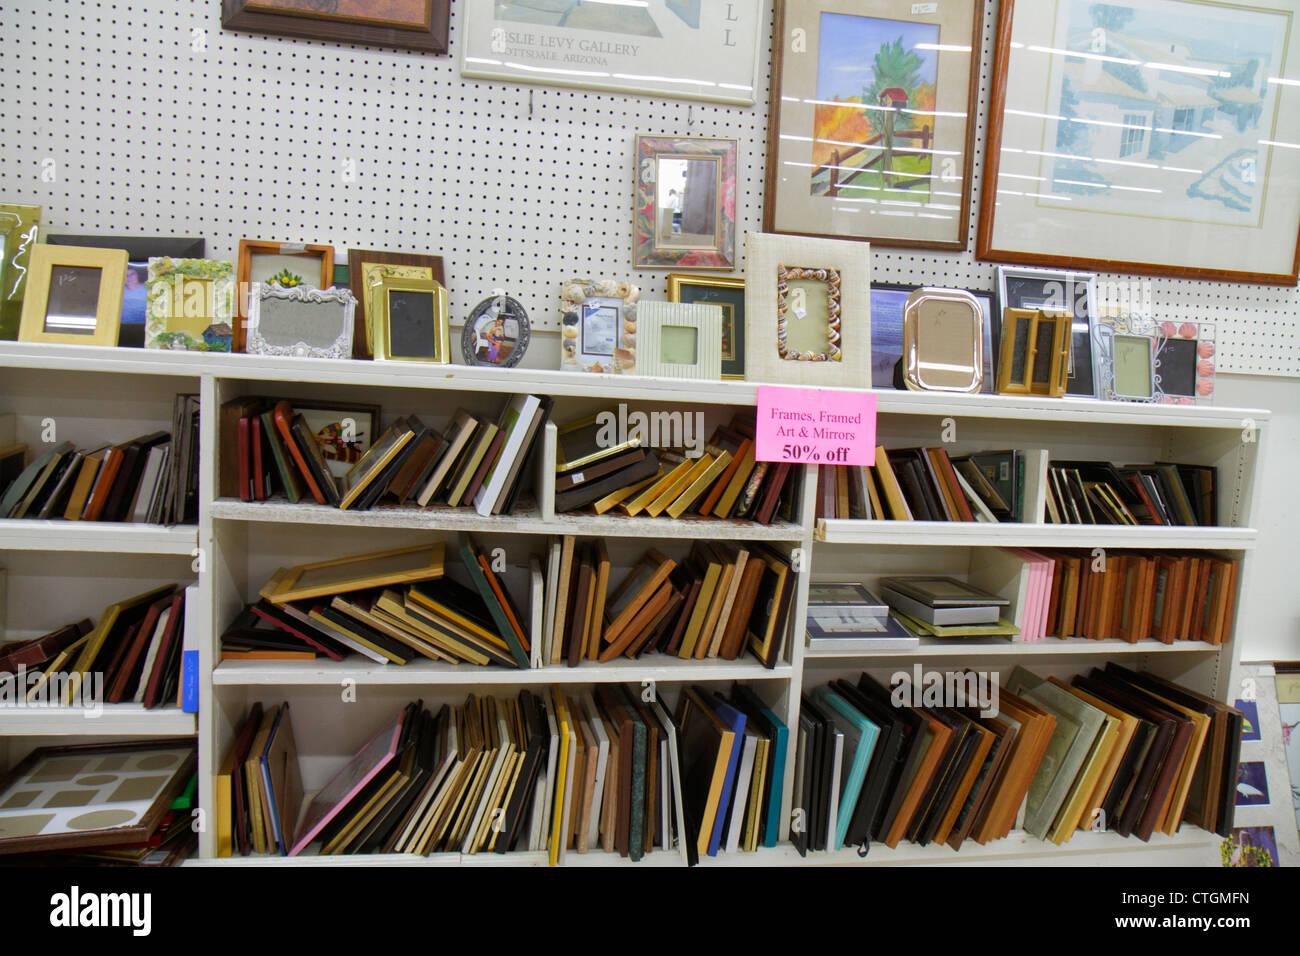 Vero Beach Florida Humane Society Thrift Shop Charity Interior Stock Photo Alamy